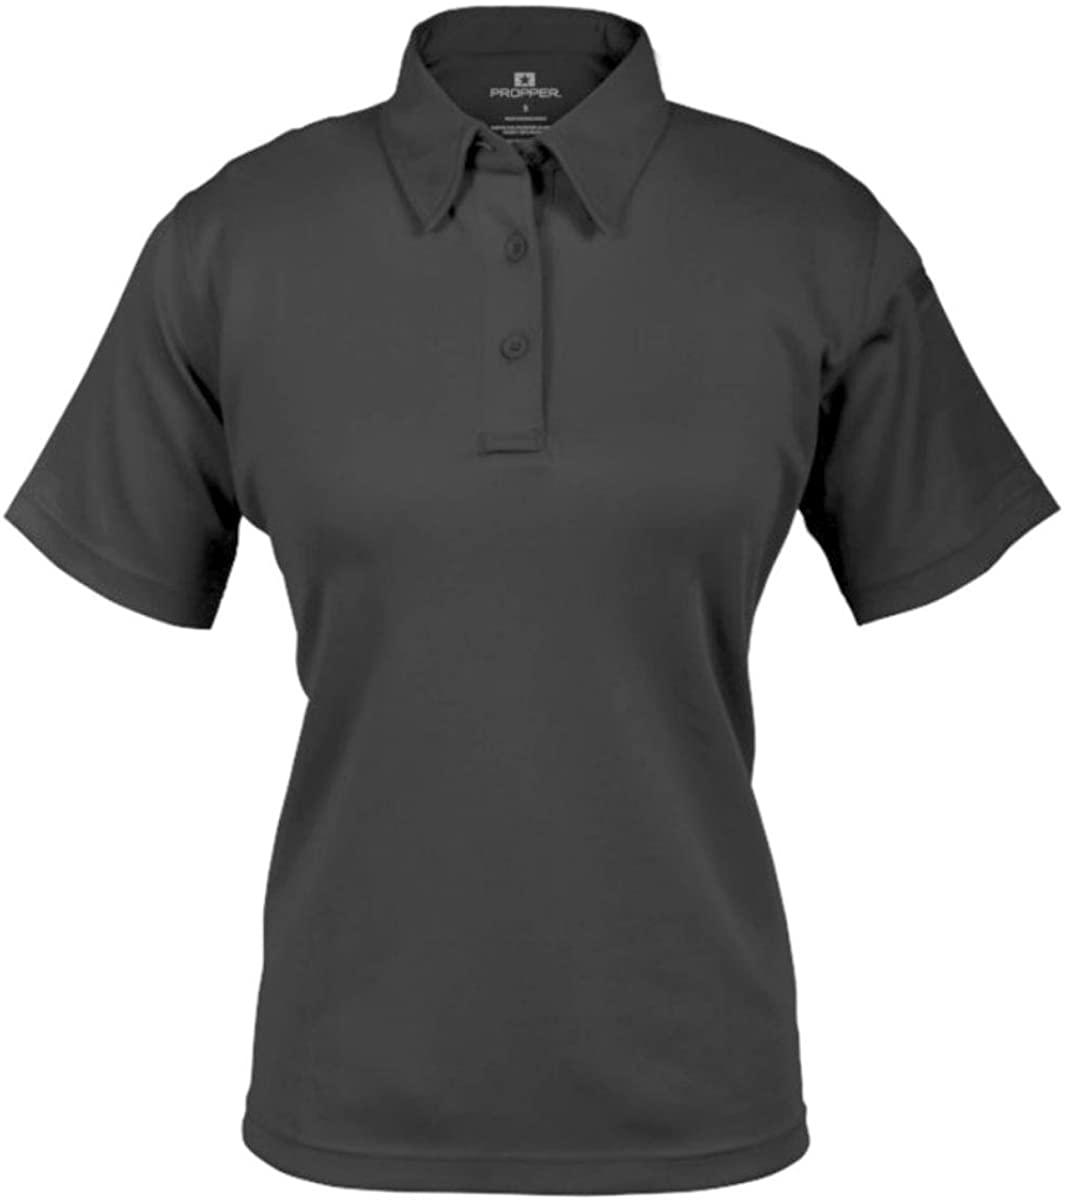 Propper F5327 Womens I.C.E. Short Sleeve Performance Polo Shirt, Charcoal